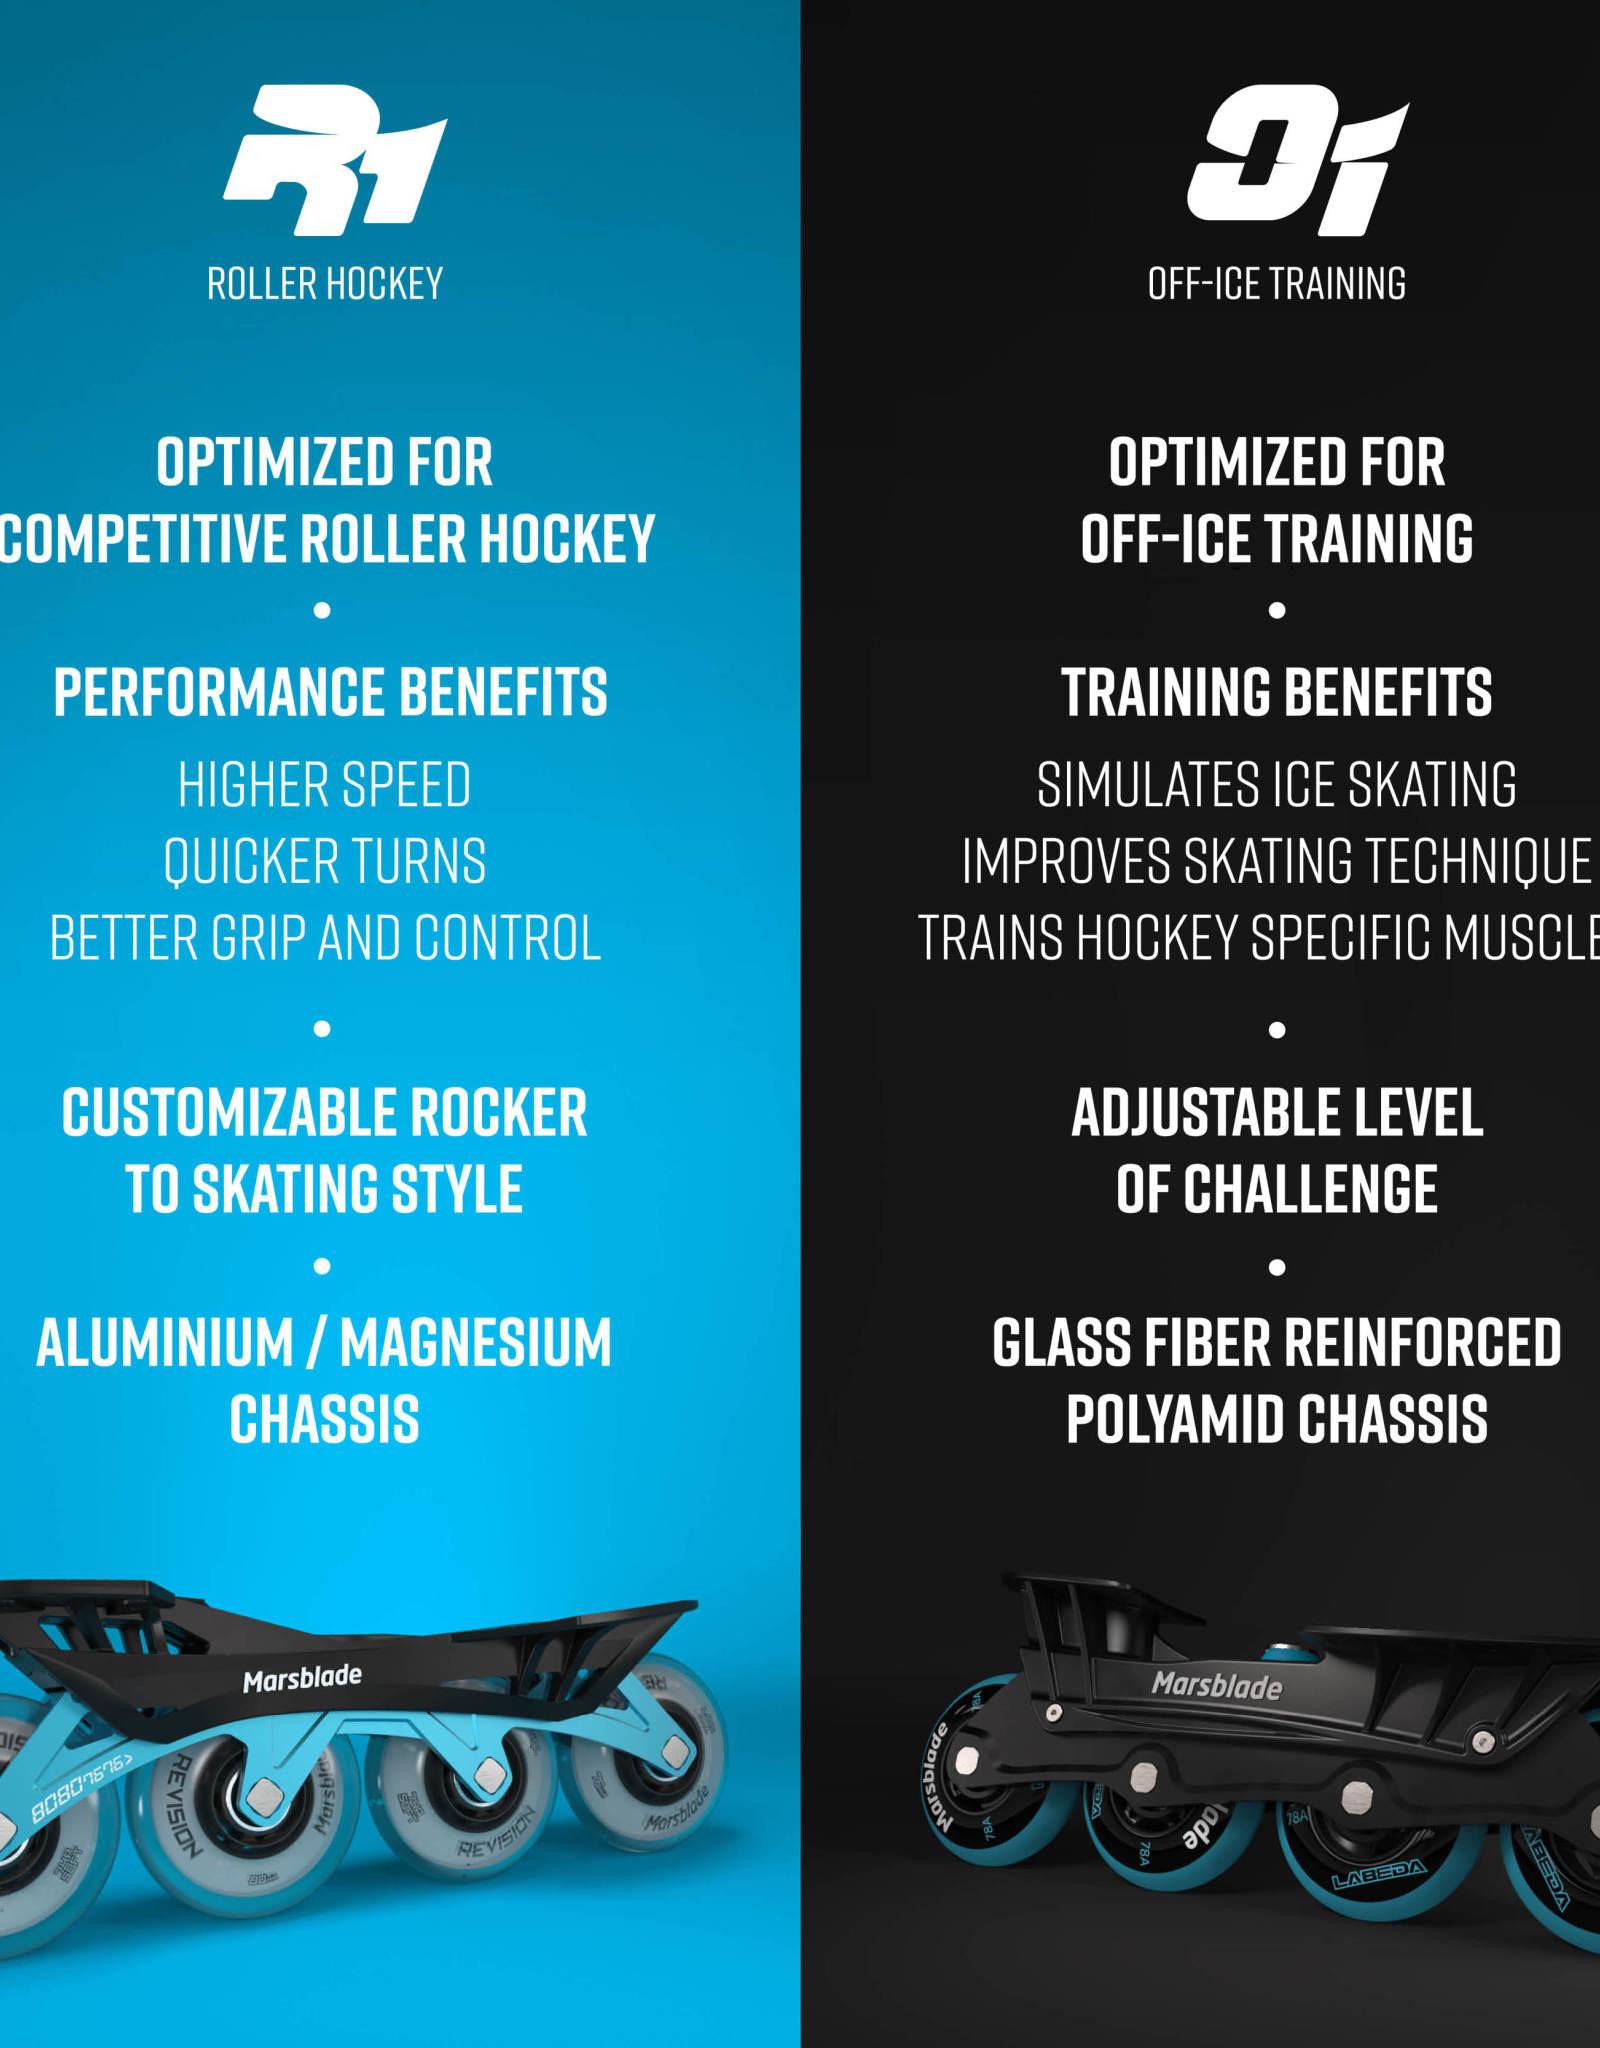 Marsblade Marsblade R1 Kit (Roller Hockey Chassis)